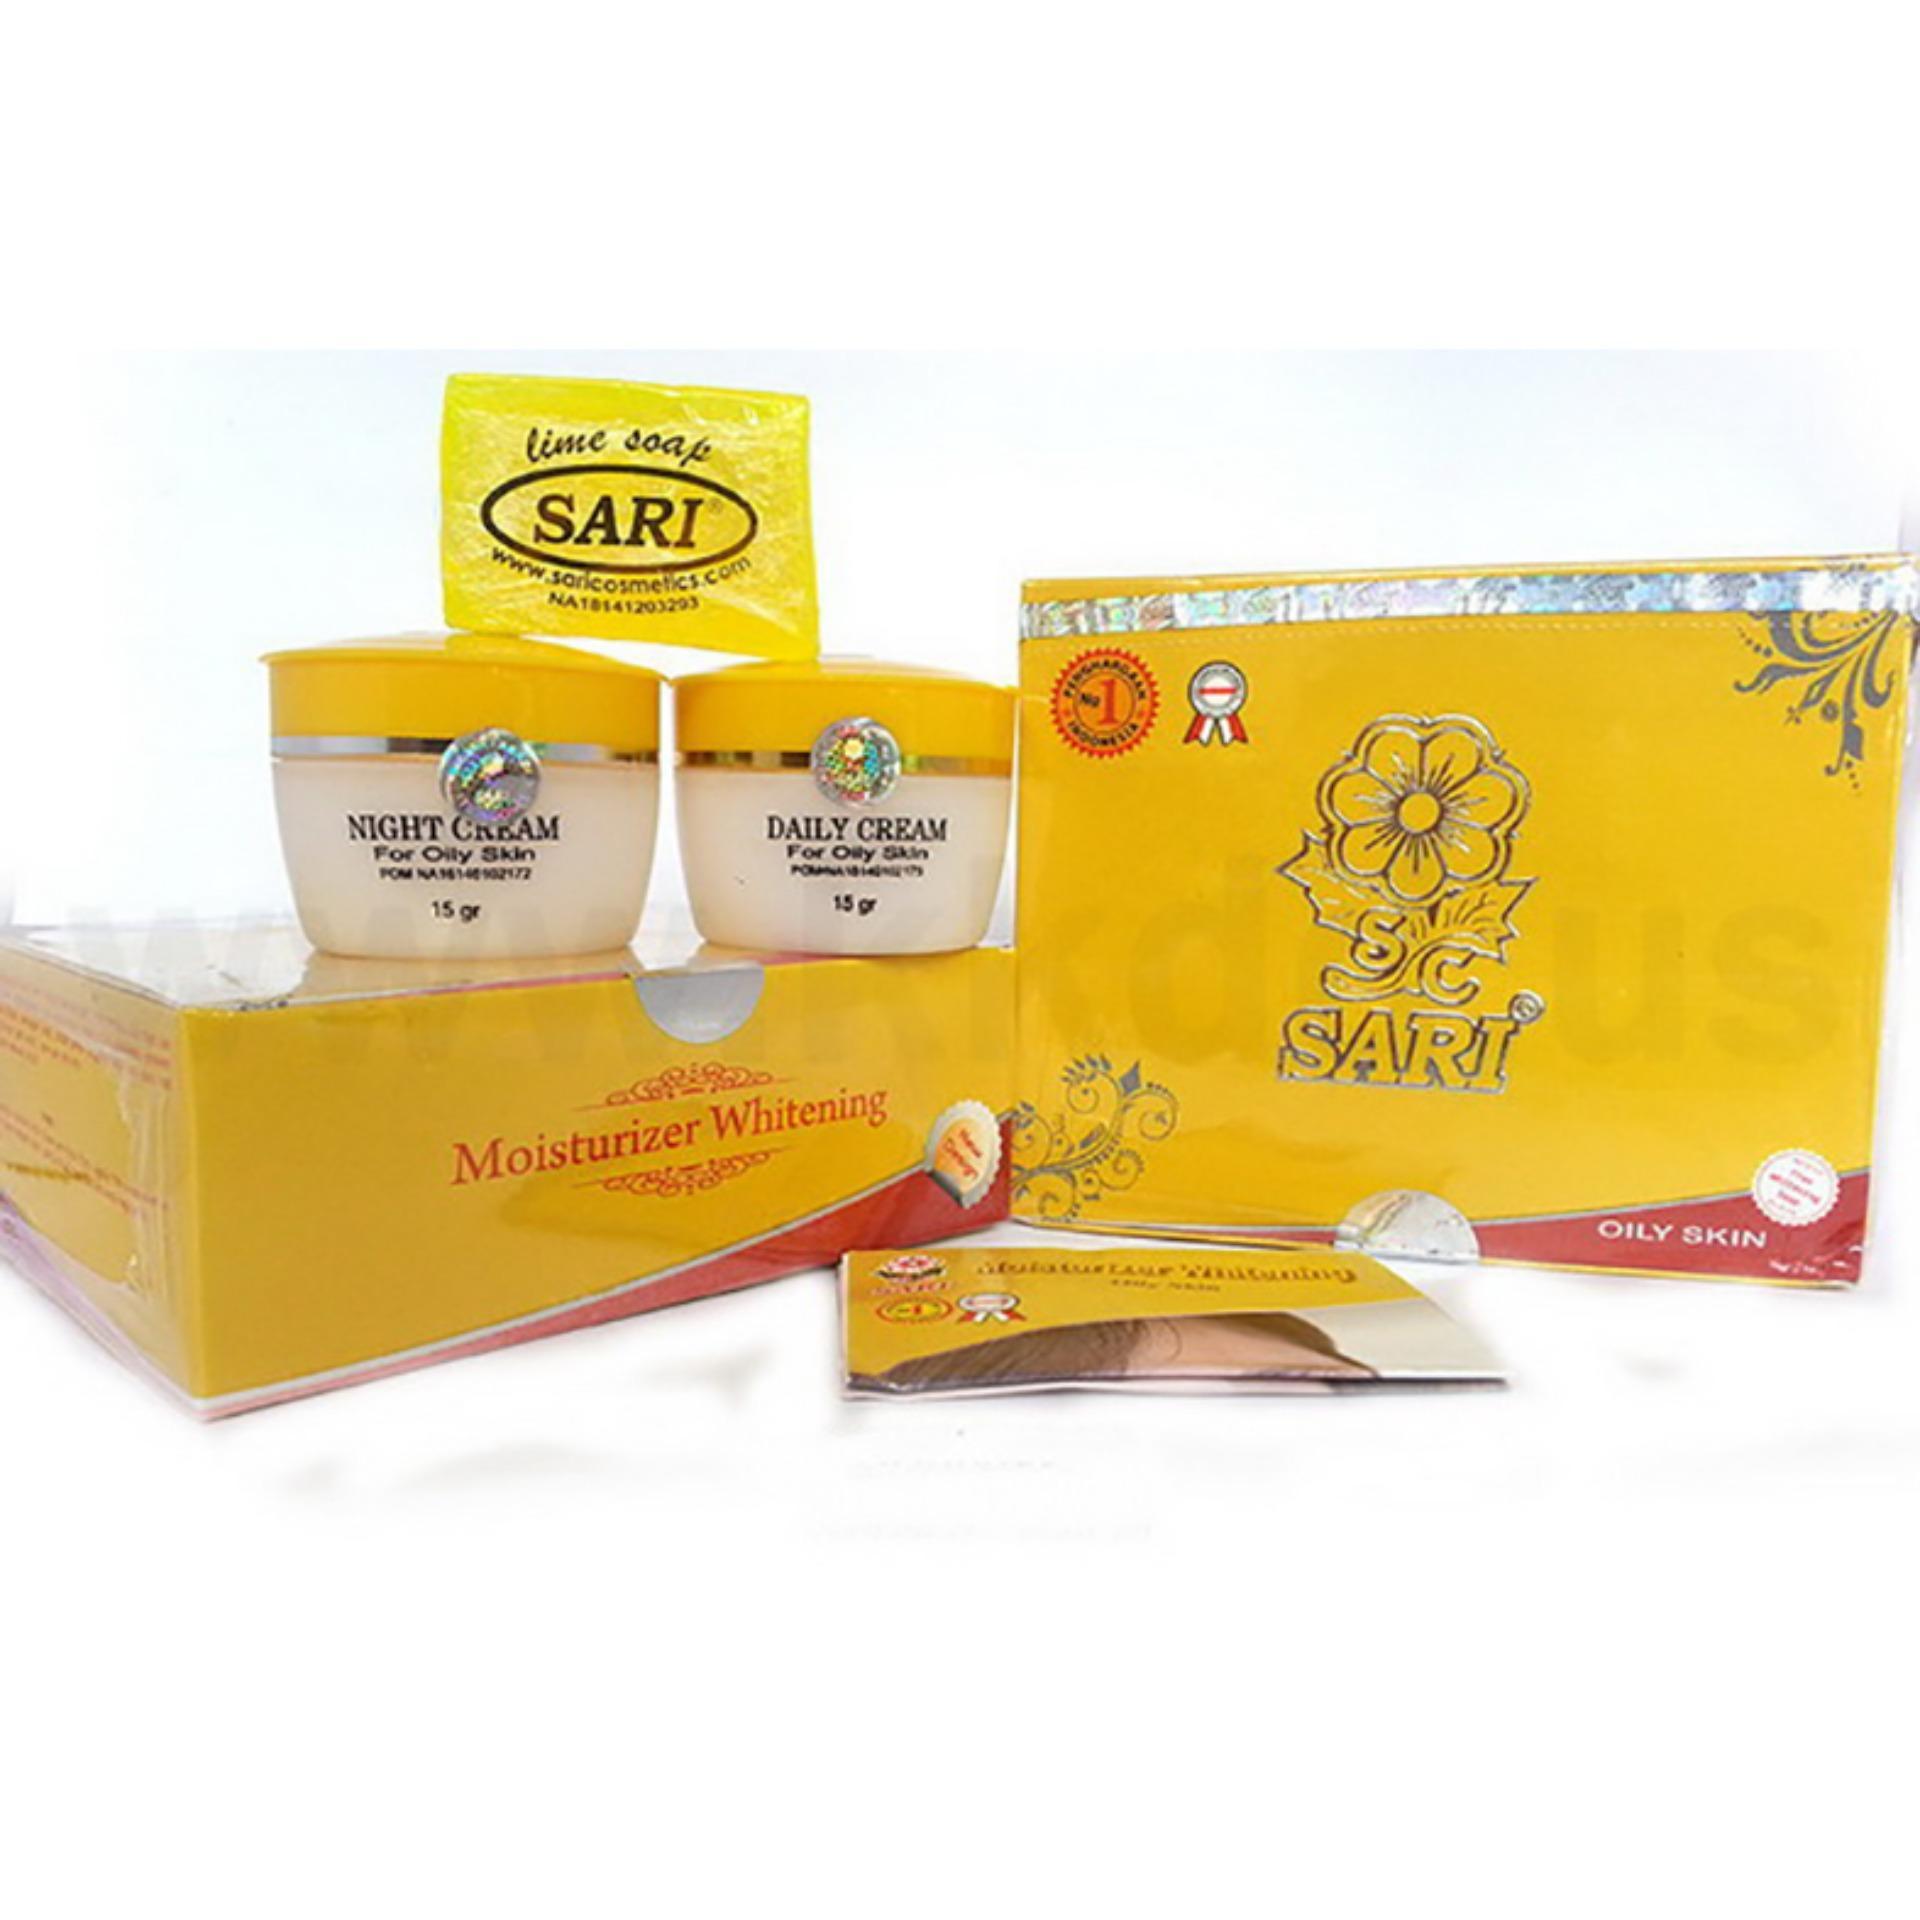 Diskon Sari Moisturizer Whitening Cream Kuning Wajah Kulit Oily Normal Berminyak Pelembab Pemutih Bpom Sari Di Dki Jakarta